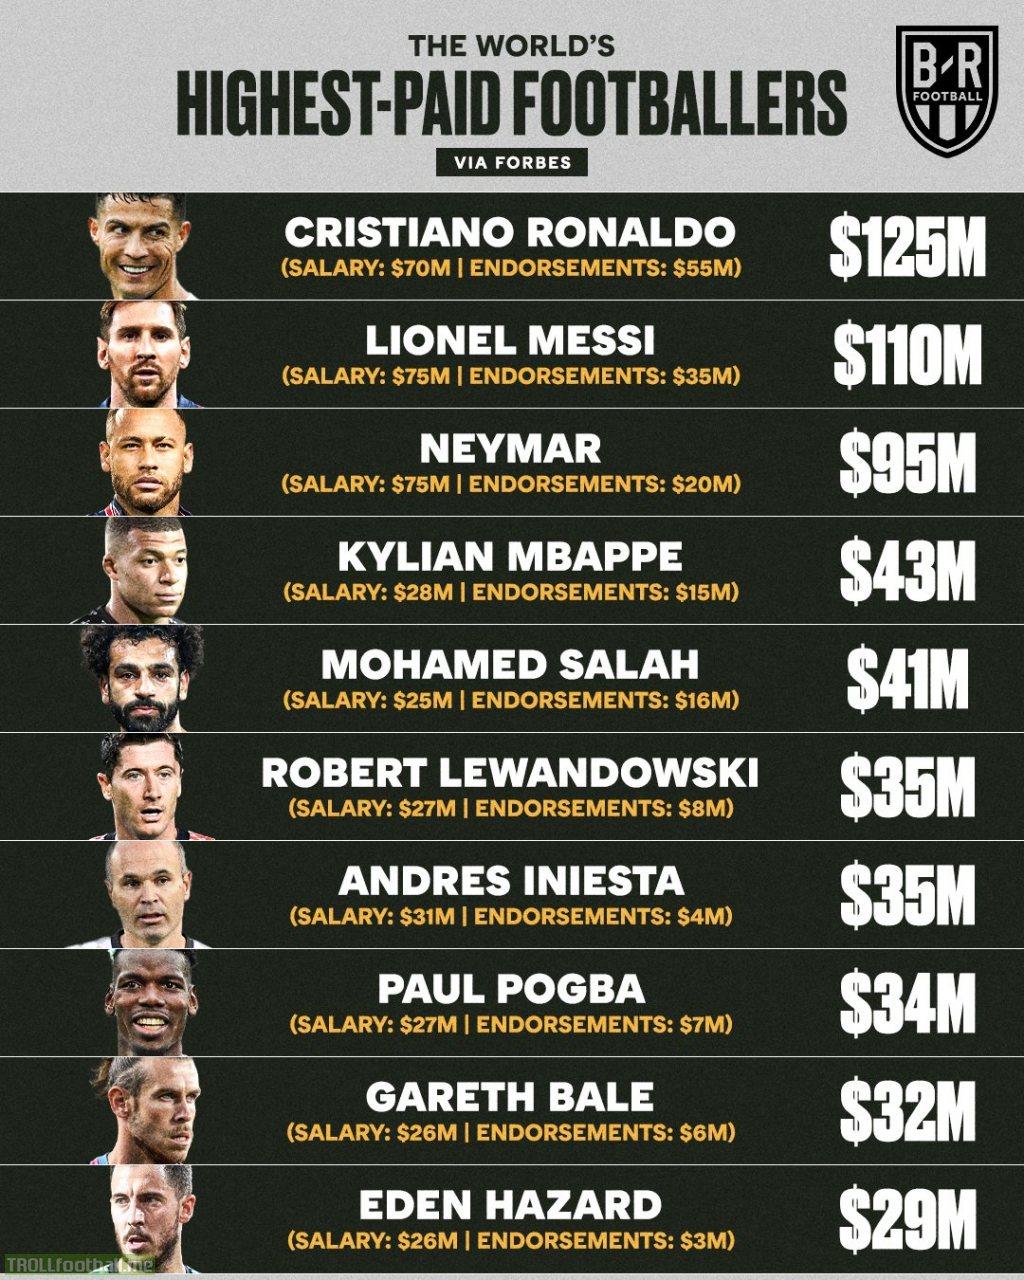 World's Highest Paid Footballers